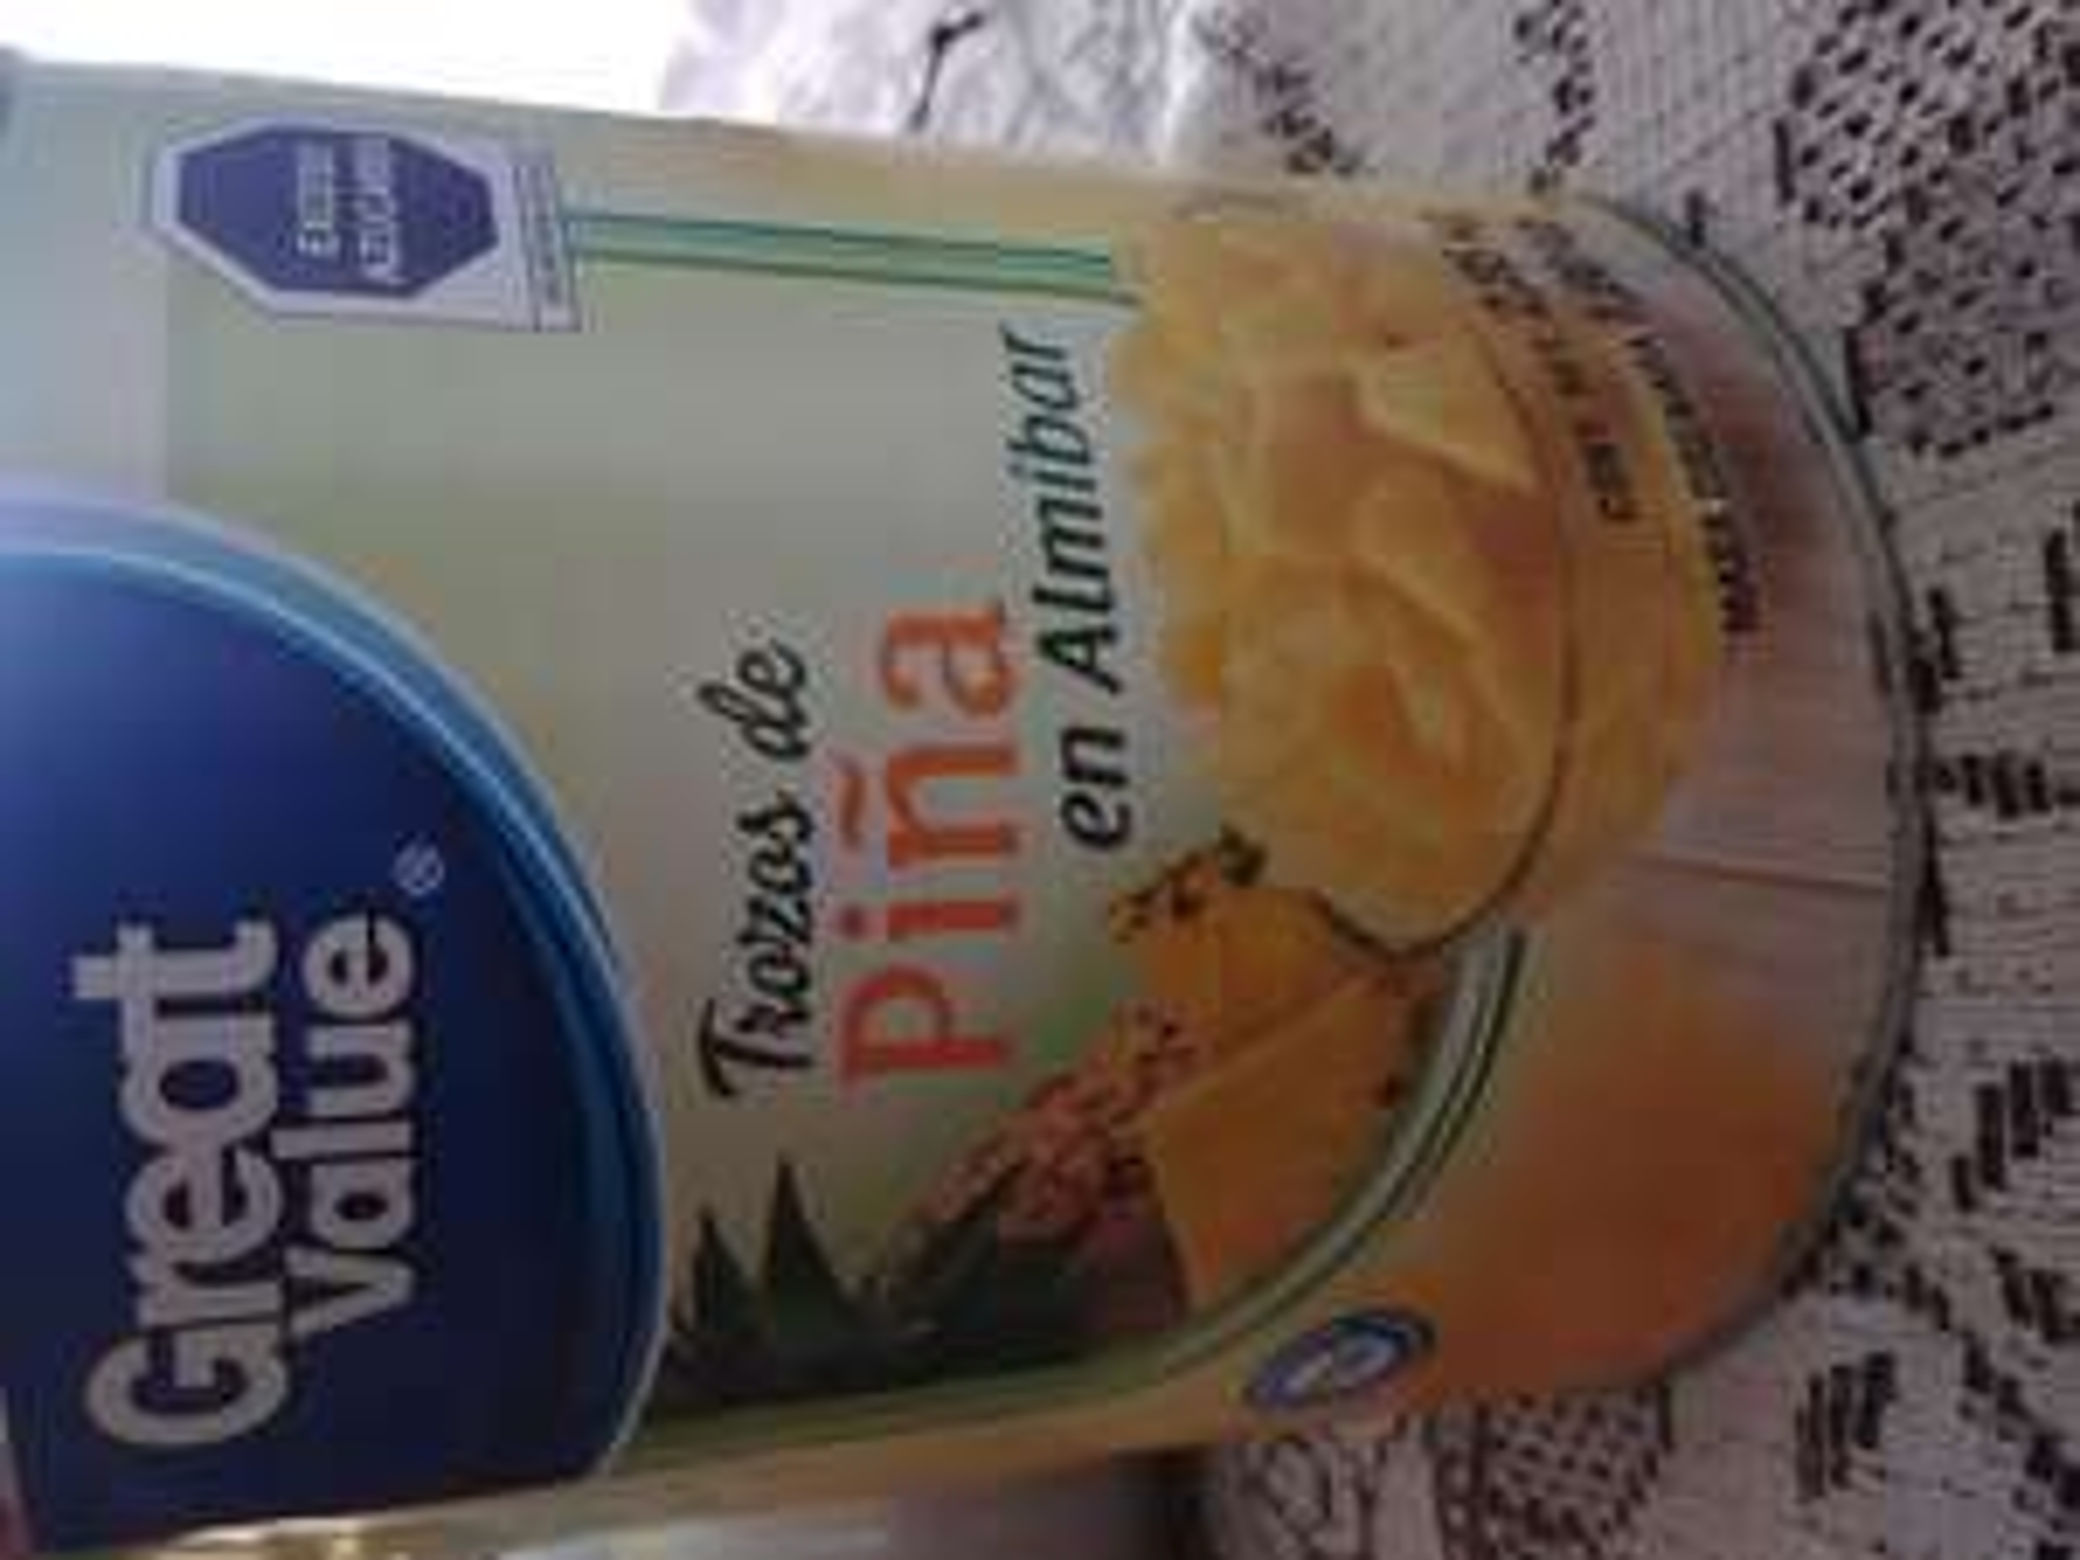 Bodega Aurrera Tlanepantla: Lata de piña Great Value de 2,85 kg